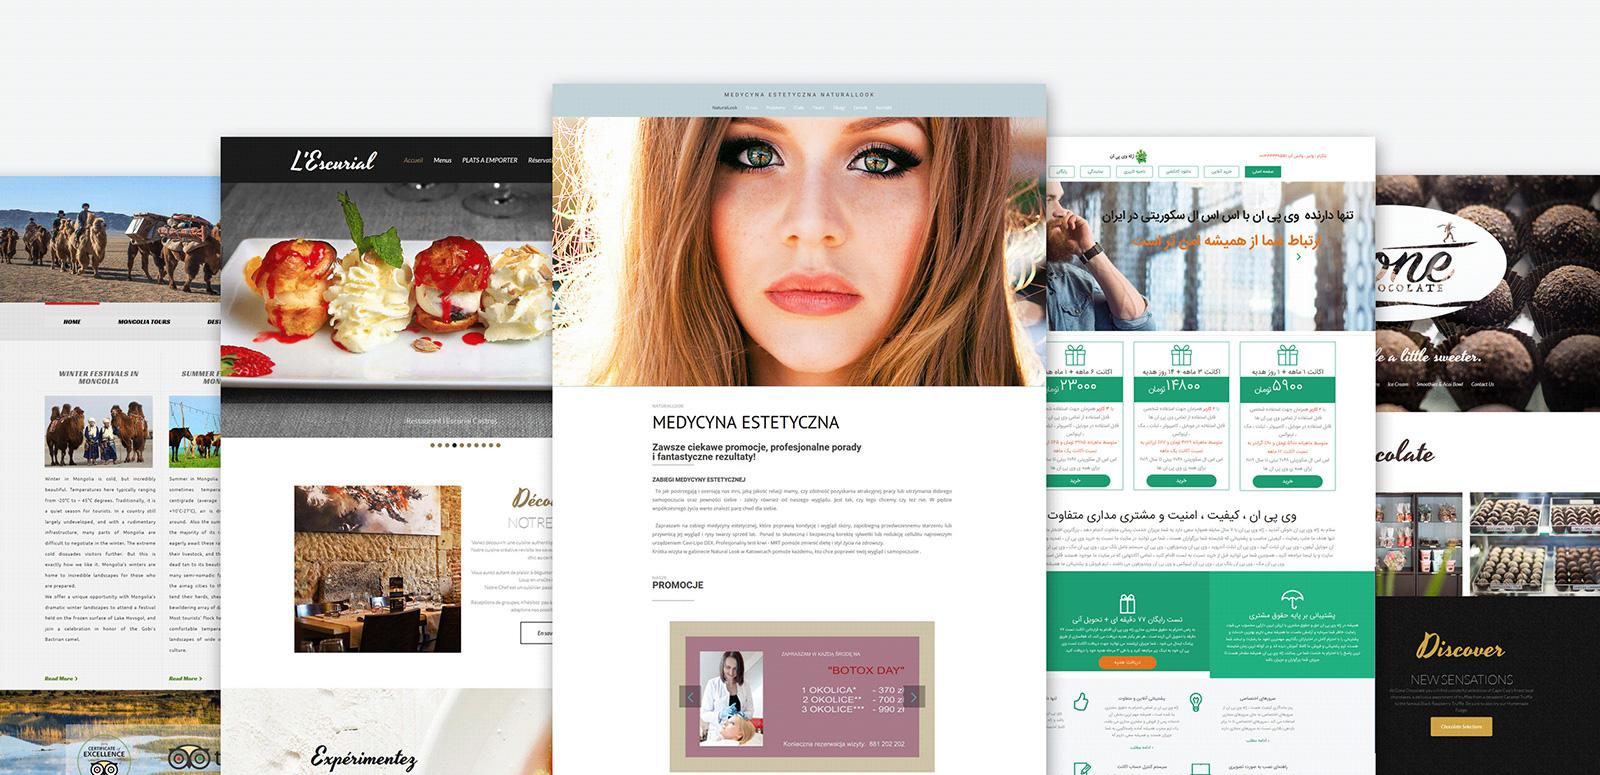 Glosstyle - Beauty Salon Moto CMS 3 Template